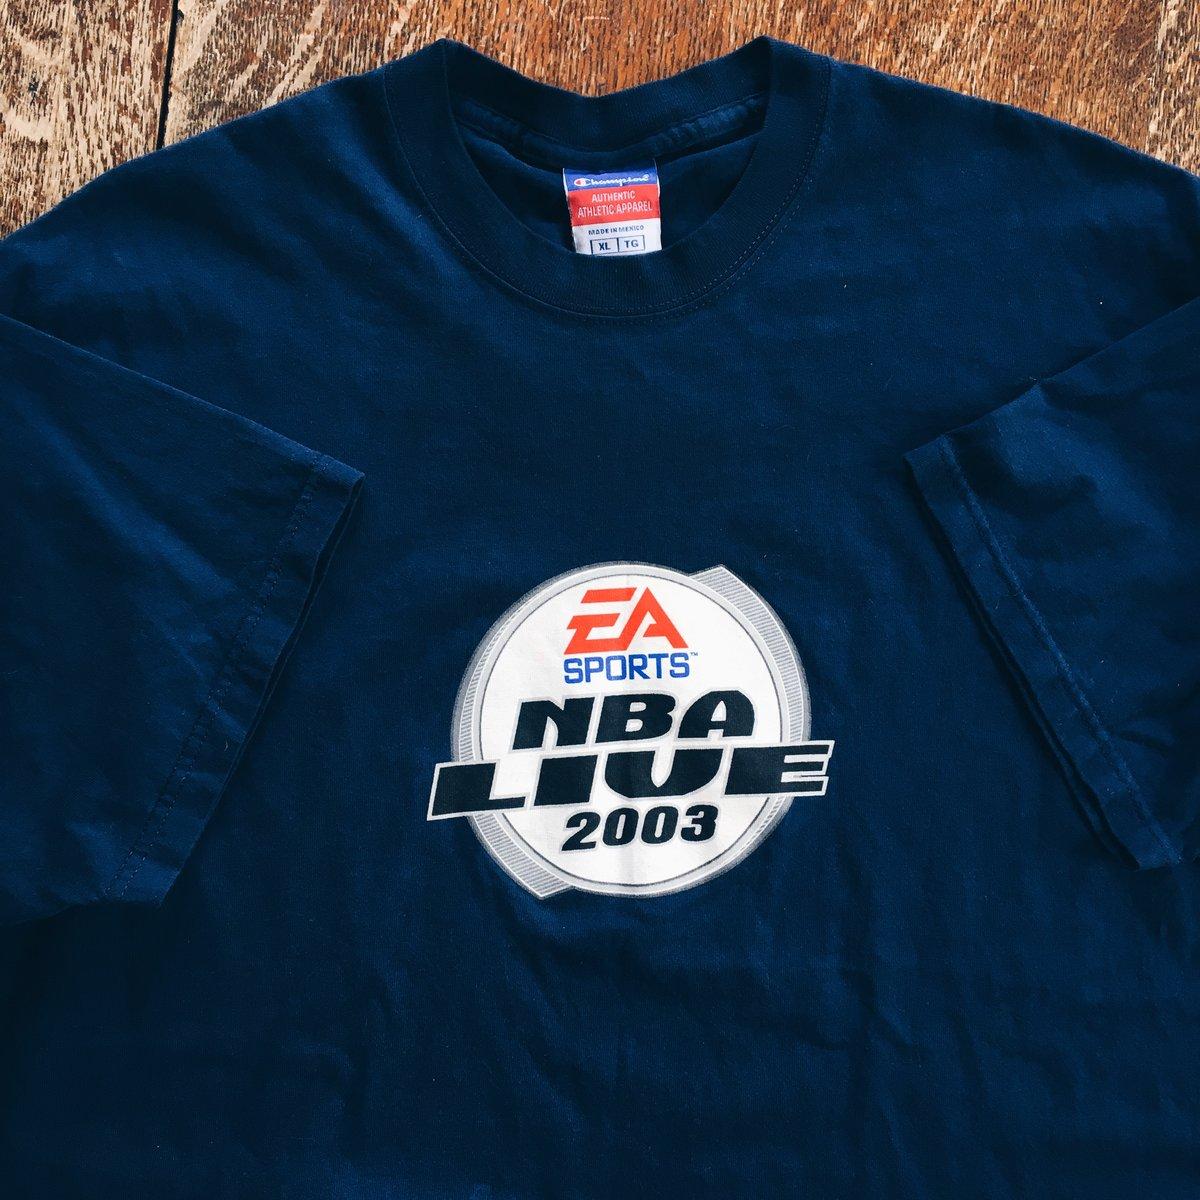 Image of Original 2003 Champion EA Sports NBA Live Promo Tee.